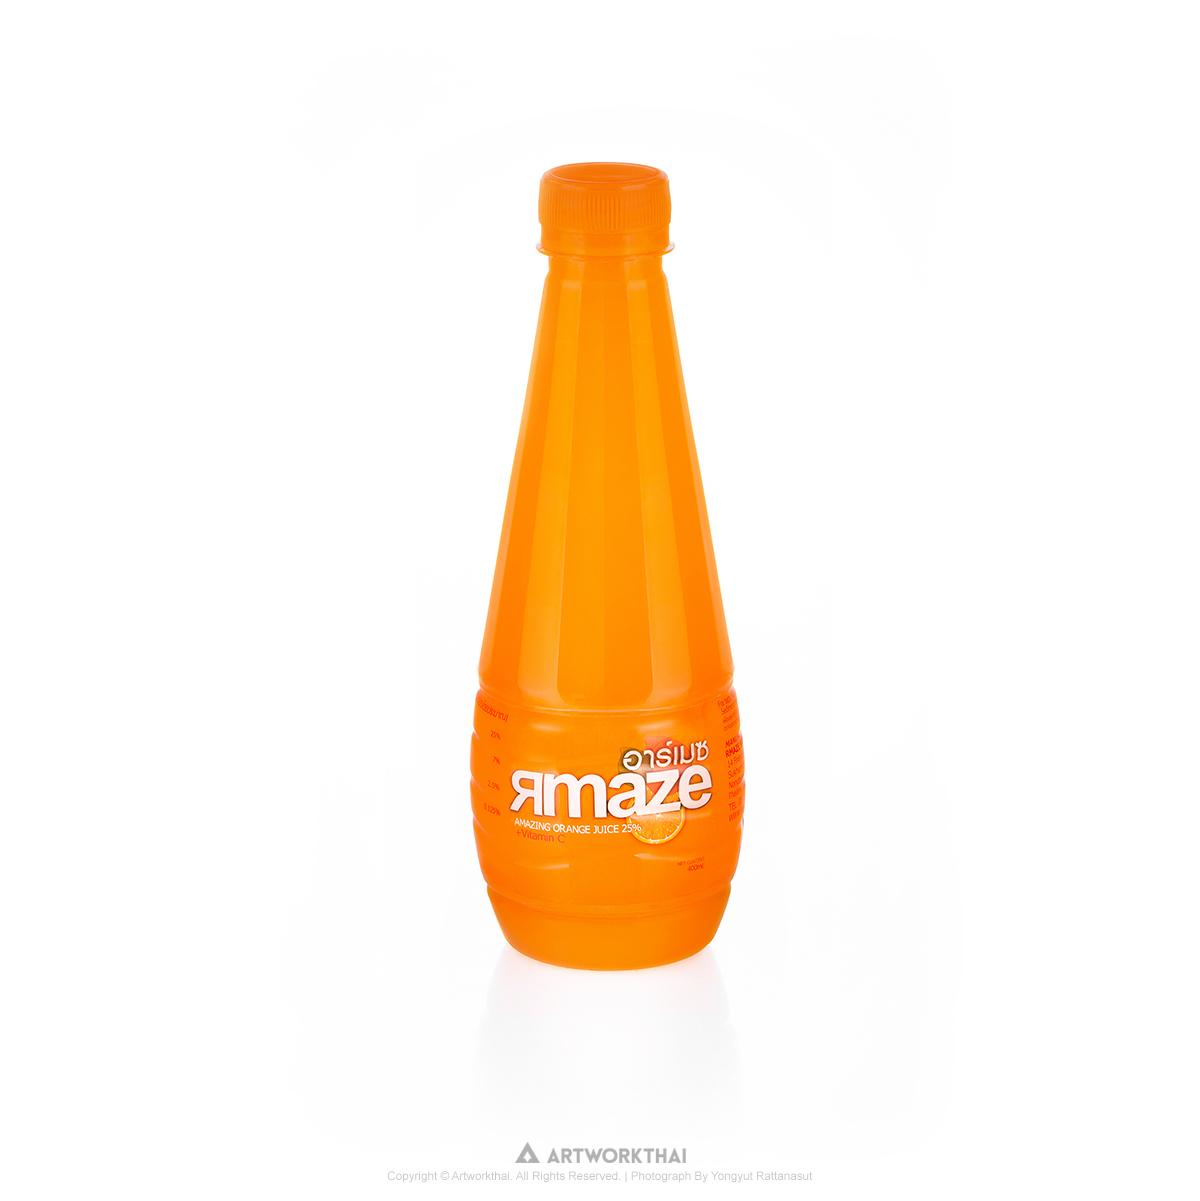 Rmaze-Product-2